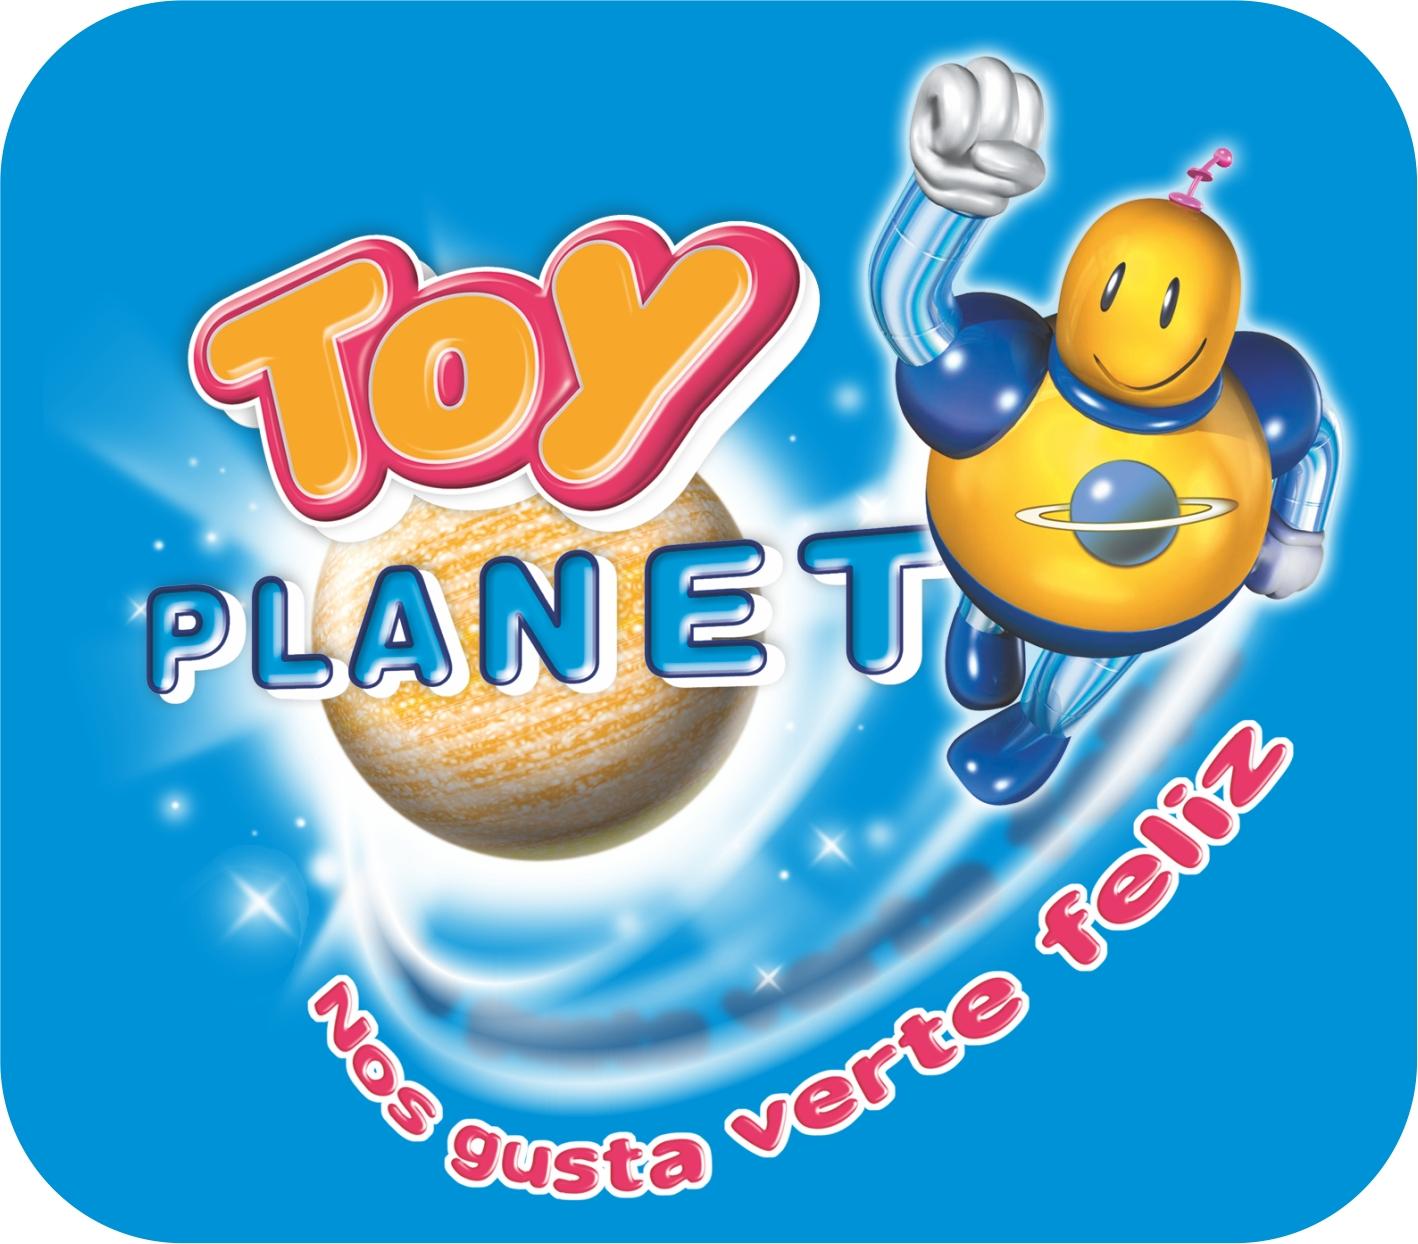 Horario lunes a s bado de 10 00 a 21 00 h - Toy planet lanzarote ...